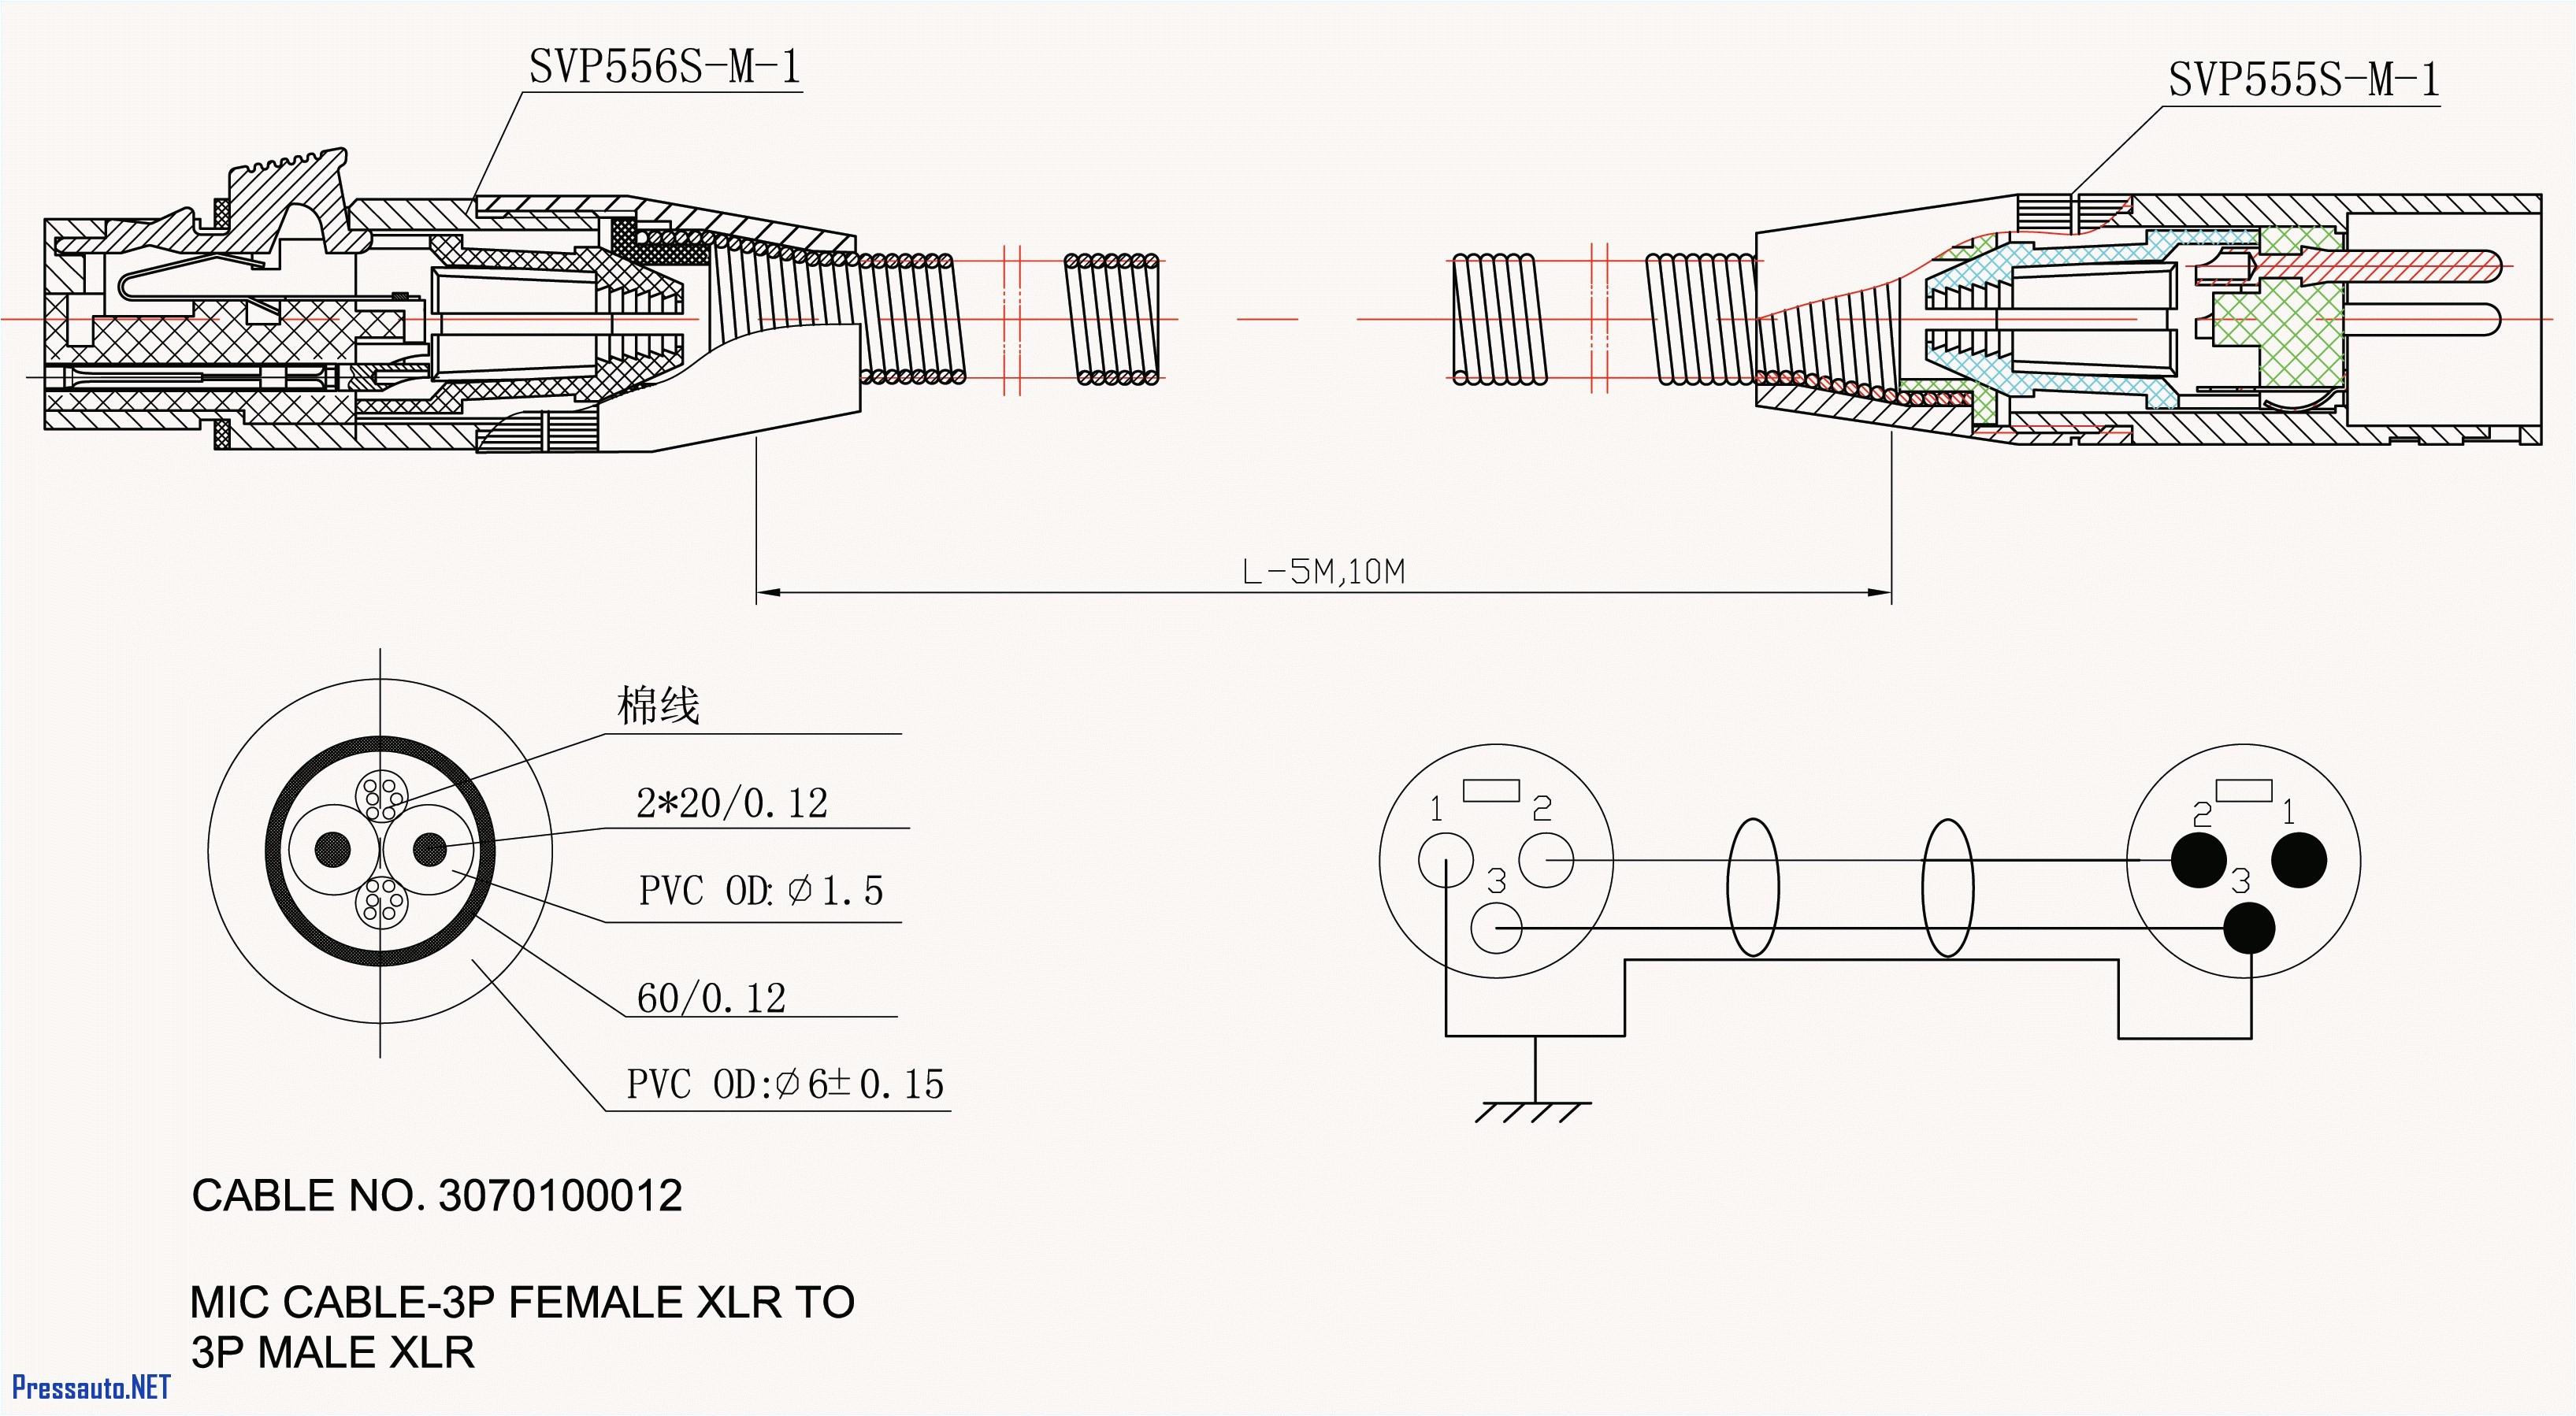 stereo headphone jack wiring diagram beautiful wiring diagram stereo headphone jack save headphone wire diagram